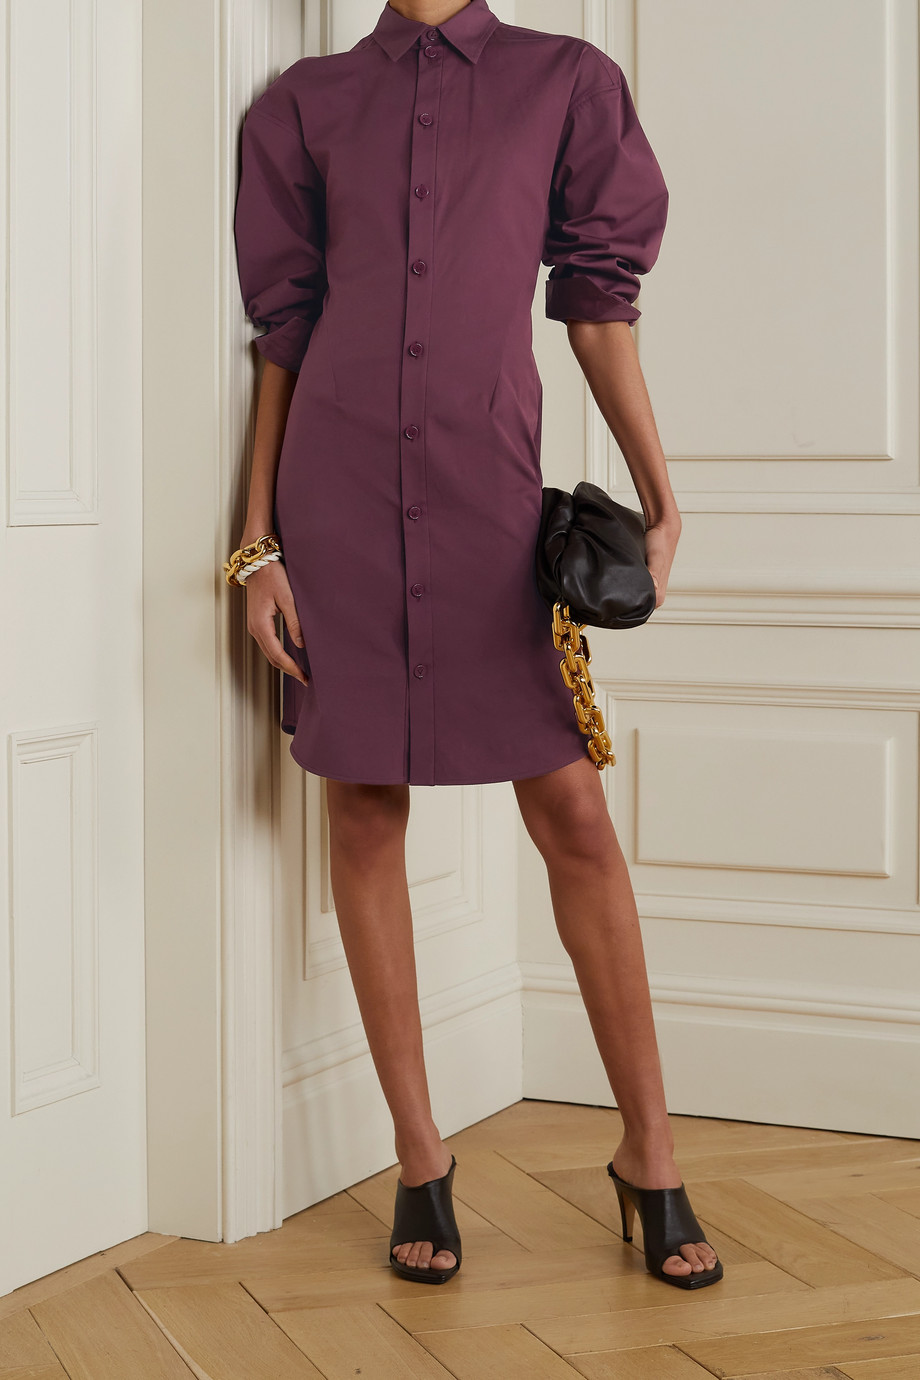 Bottega Veneta Stretch-cotton poplin shirt dress